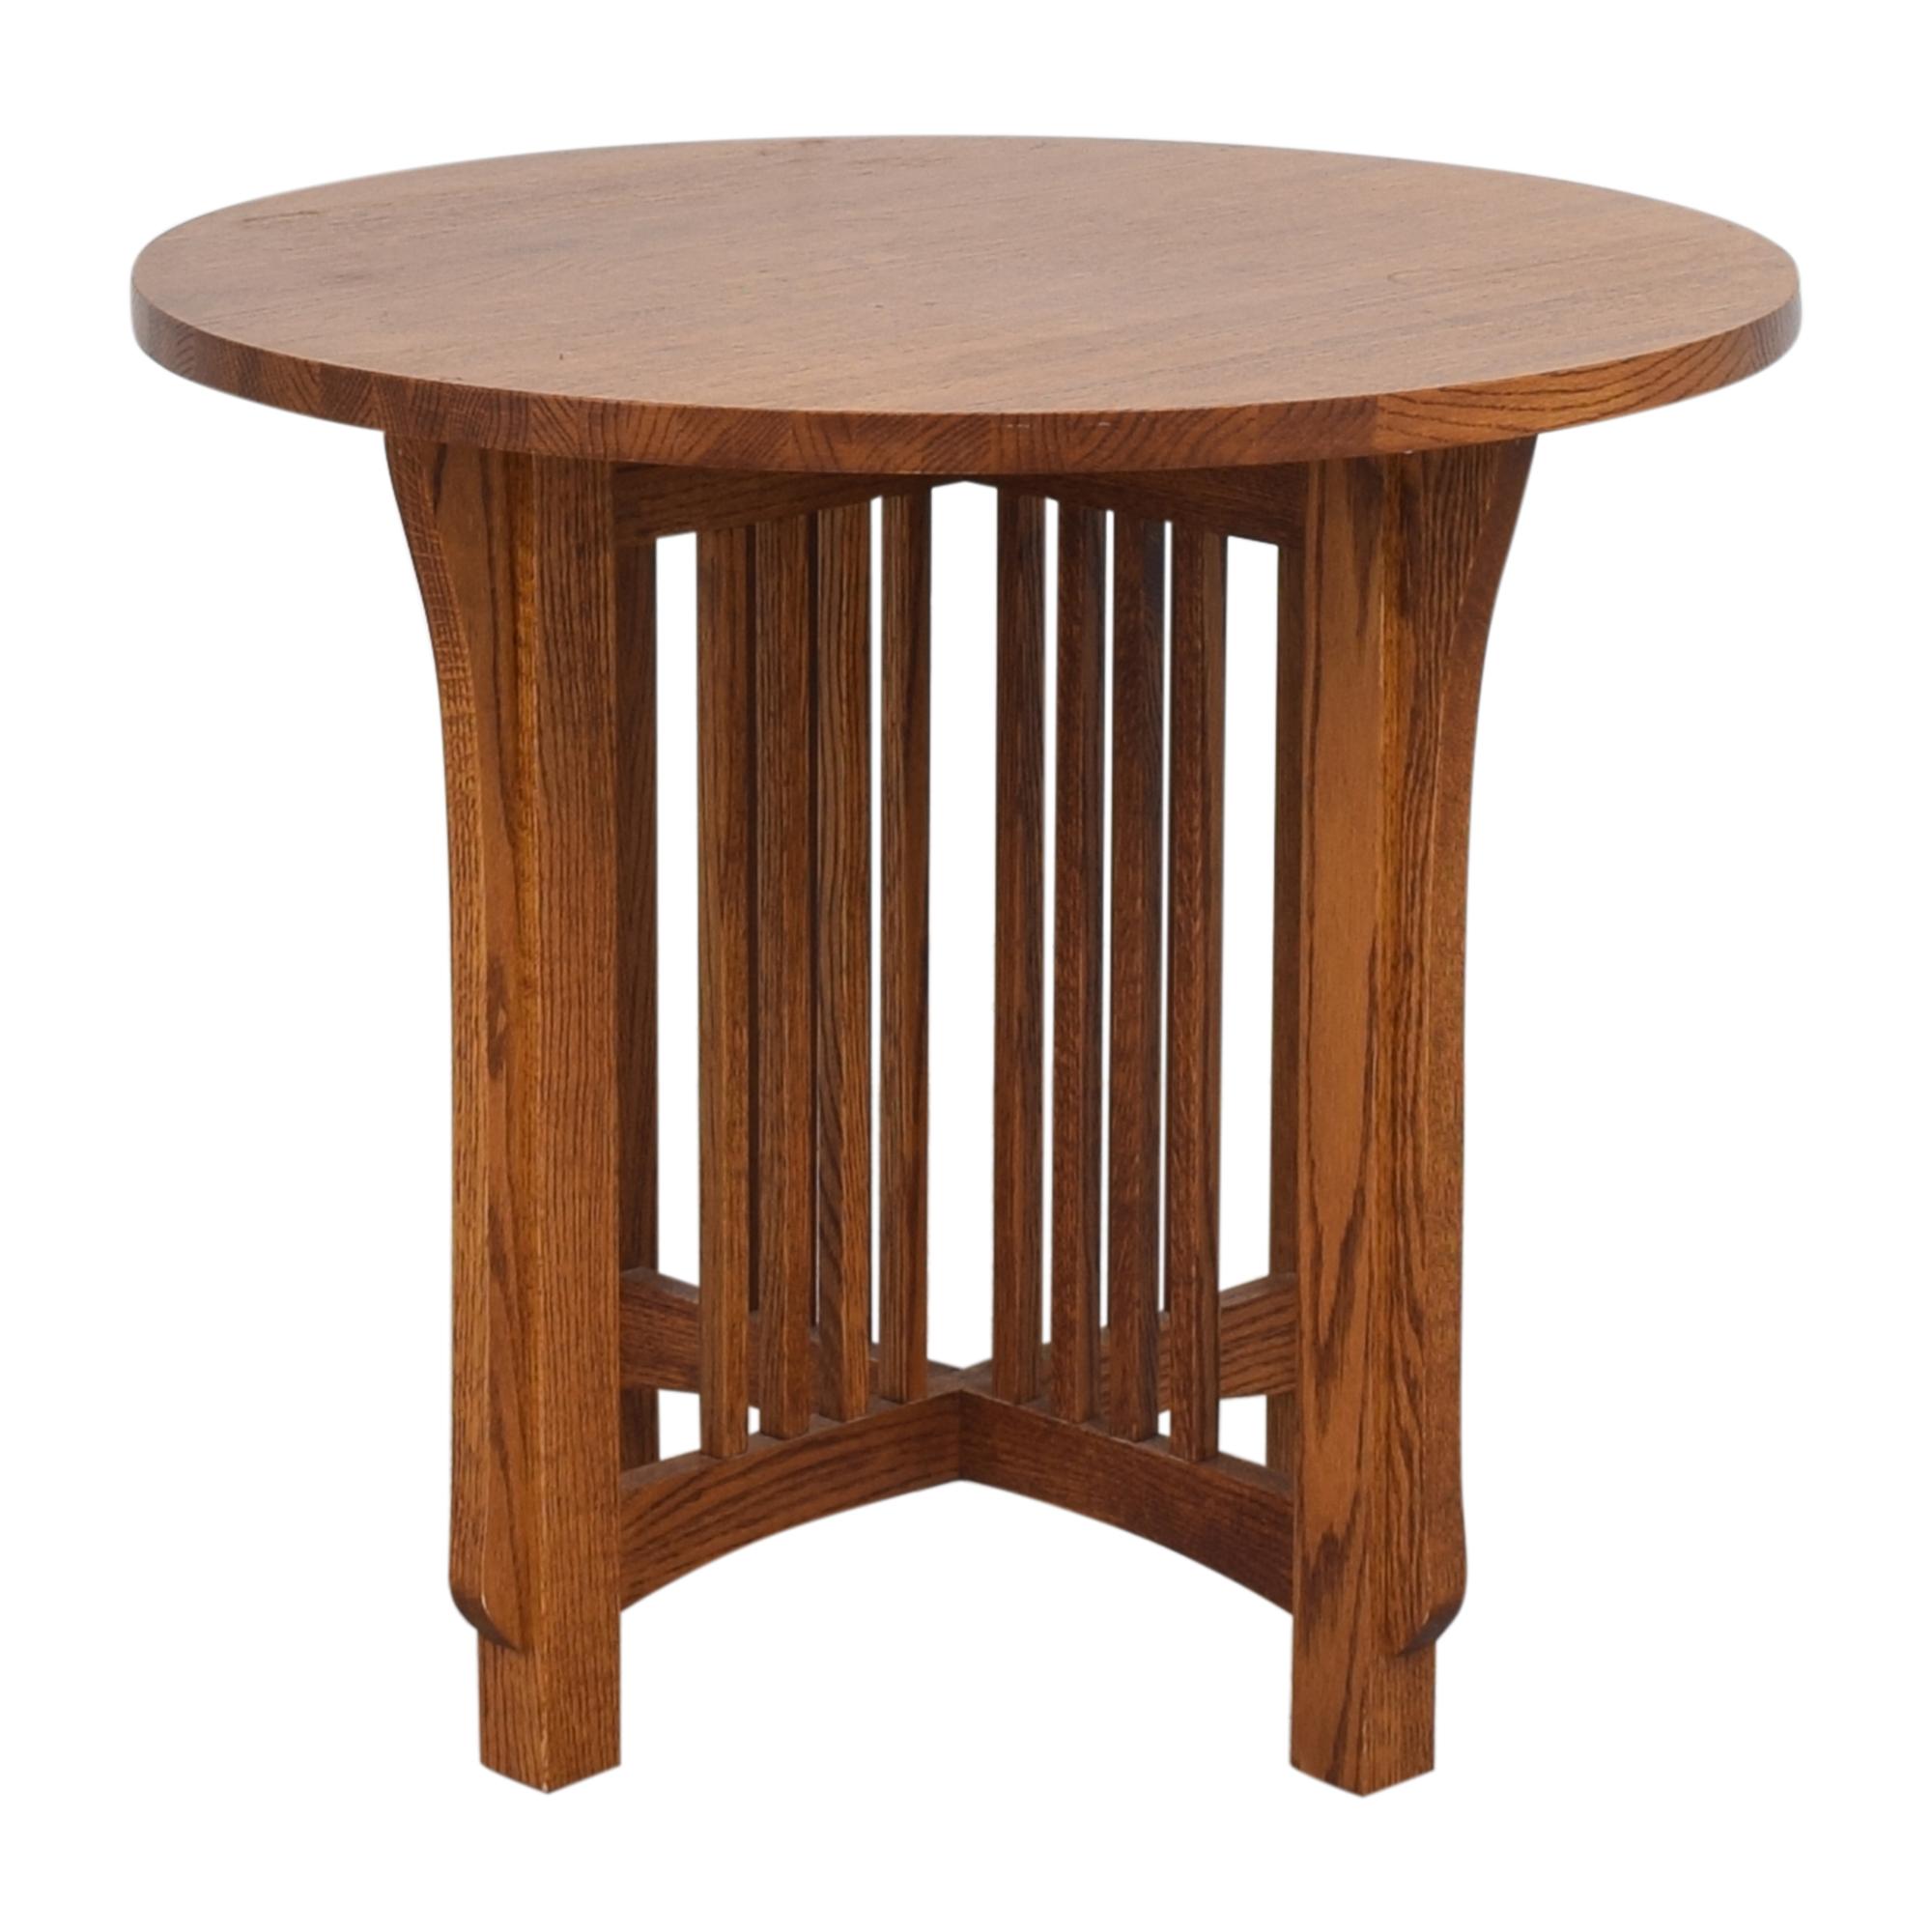 Restoration Hardware Michael's Furniture for Restoration Hardware Mission-Style Side Table price